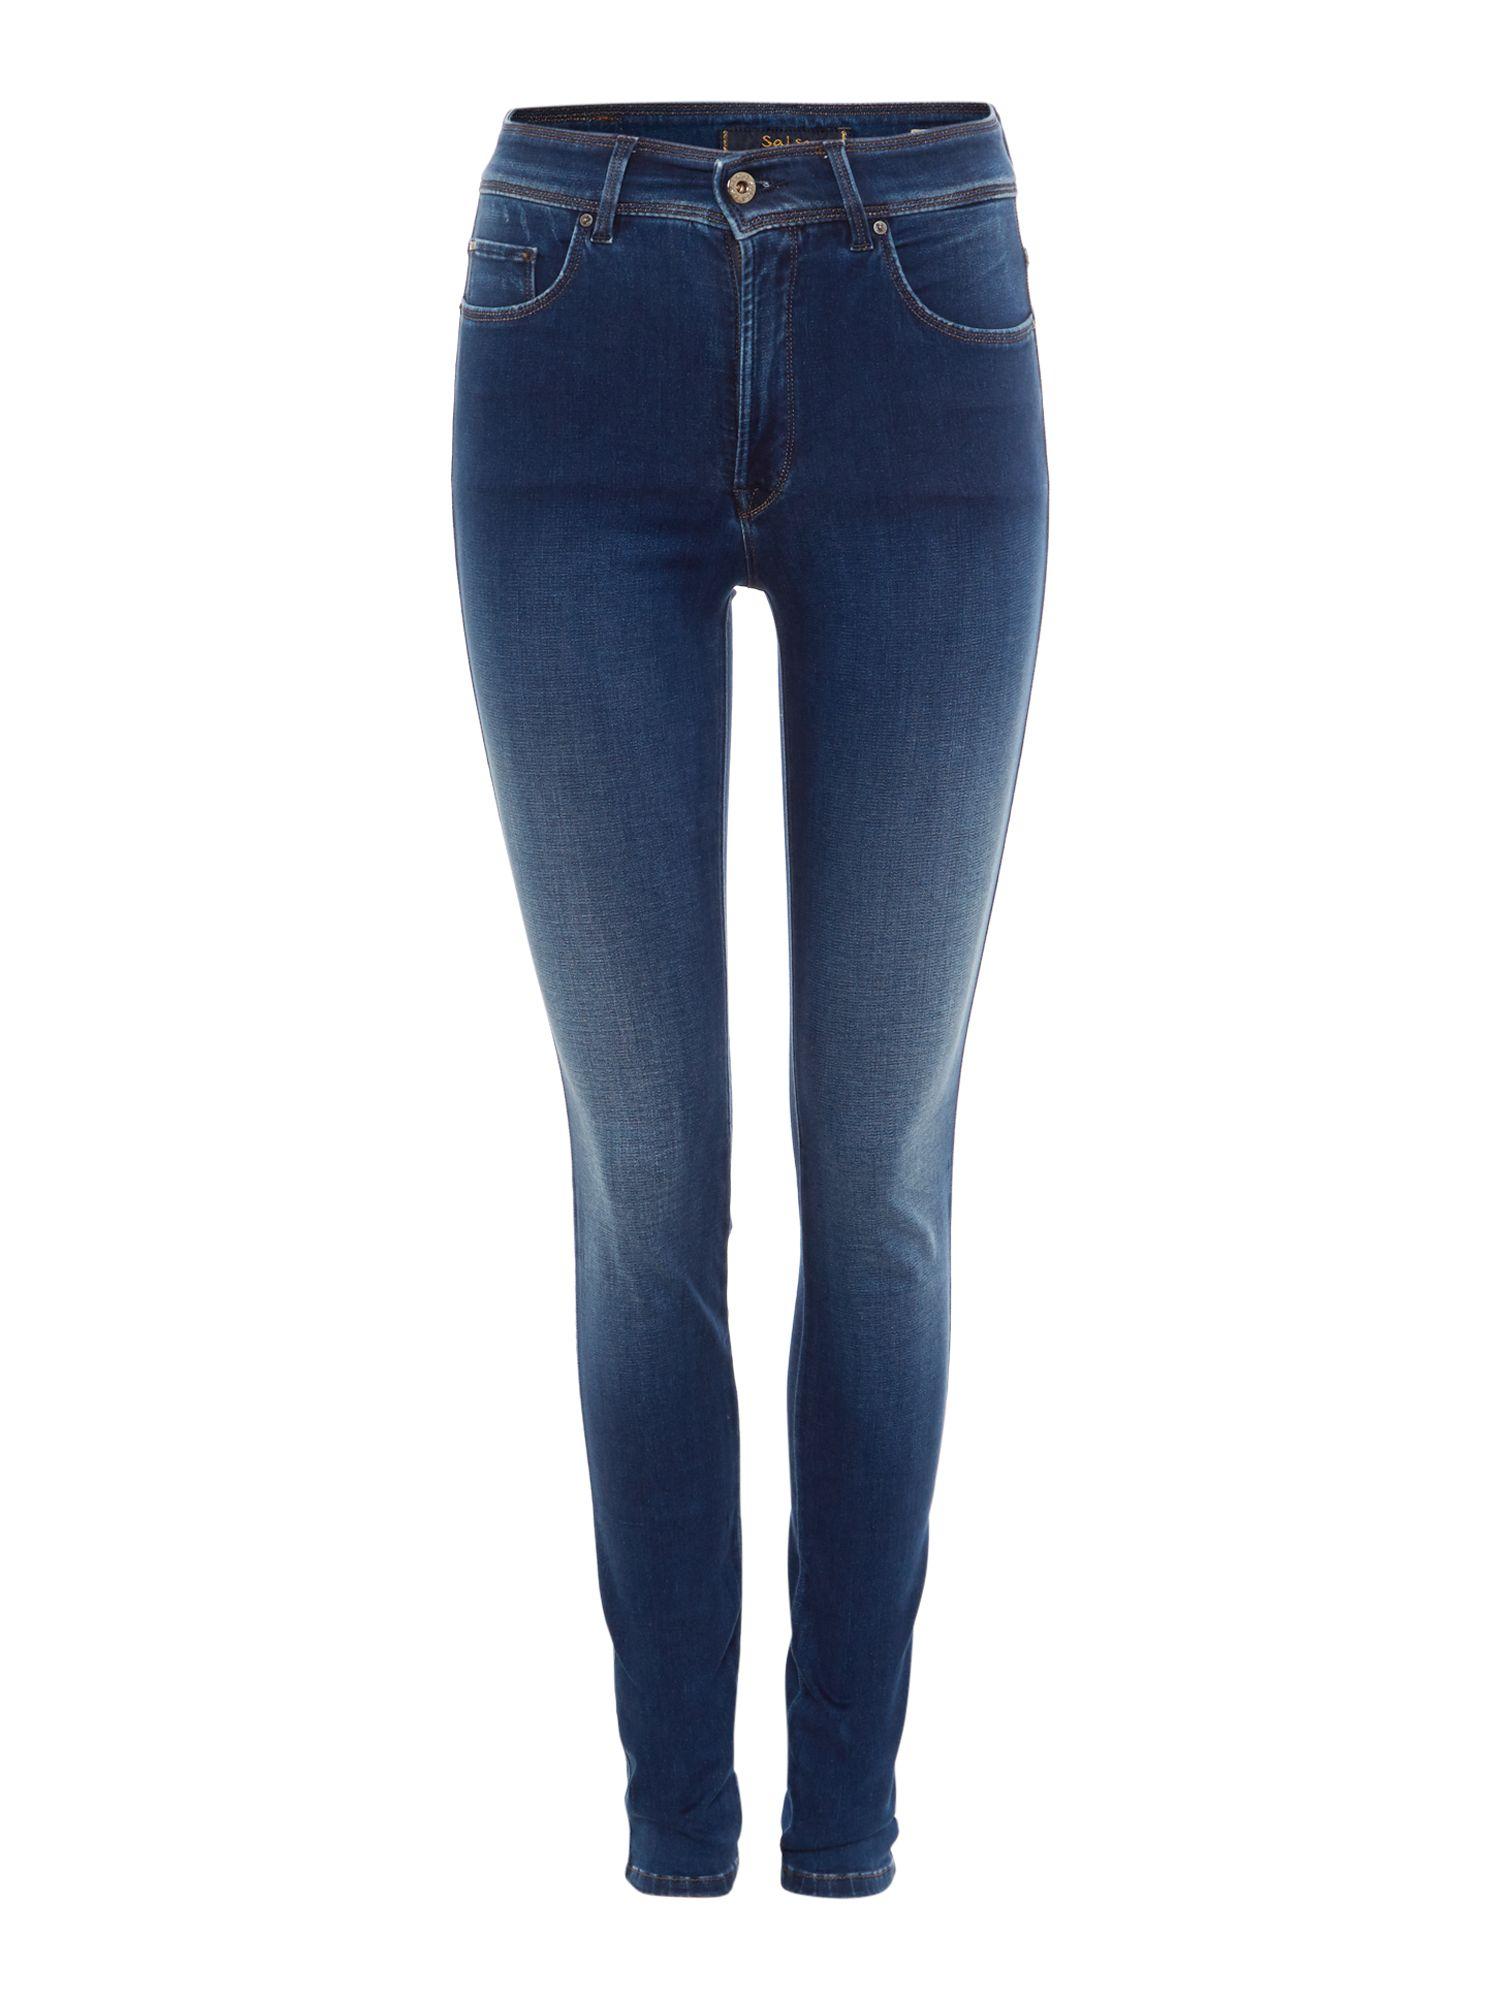 salsa high waist skinny carrie jean in mid wash in blue lyst. Black Bedroom Furniture Sets. Home Design Ideas